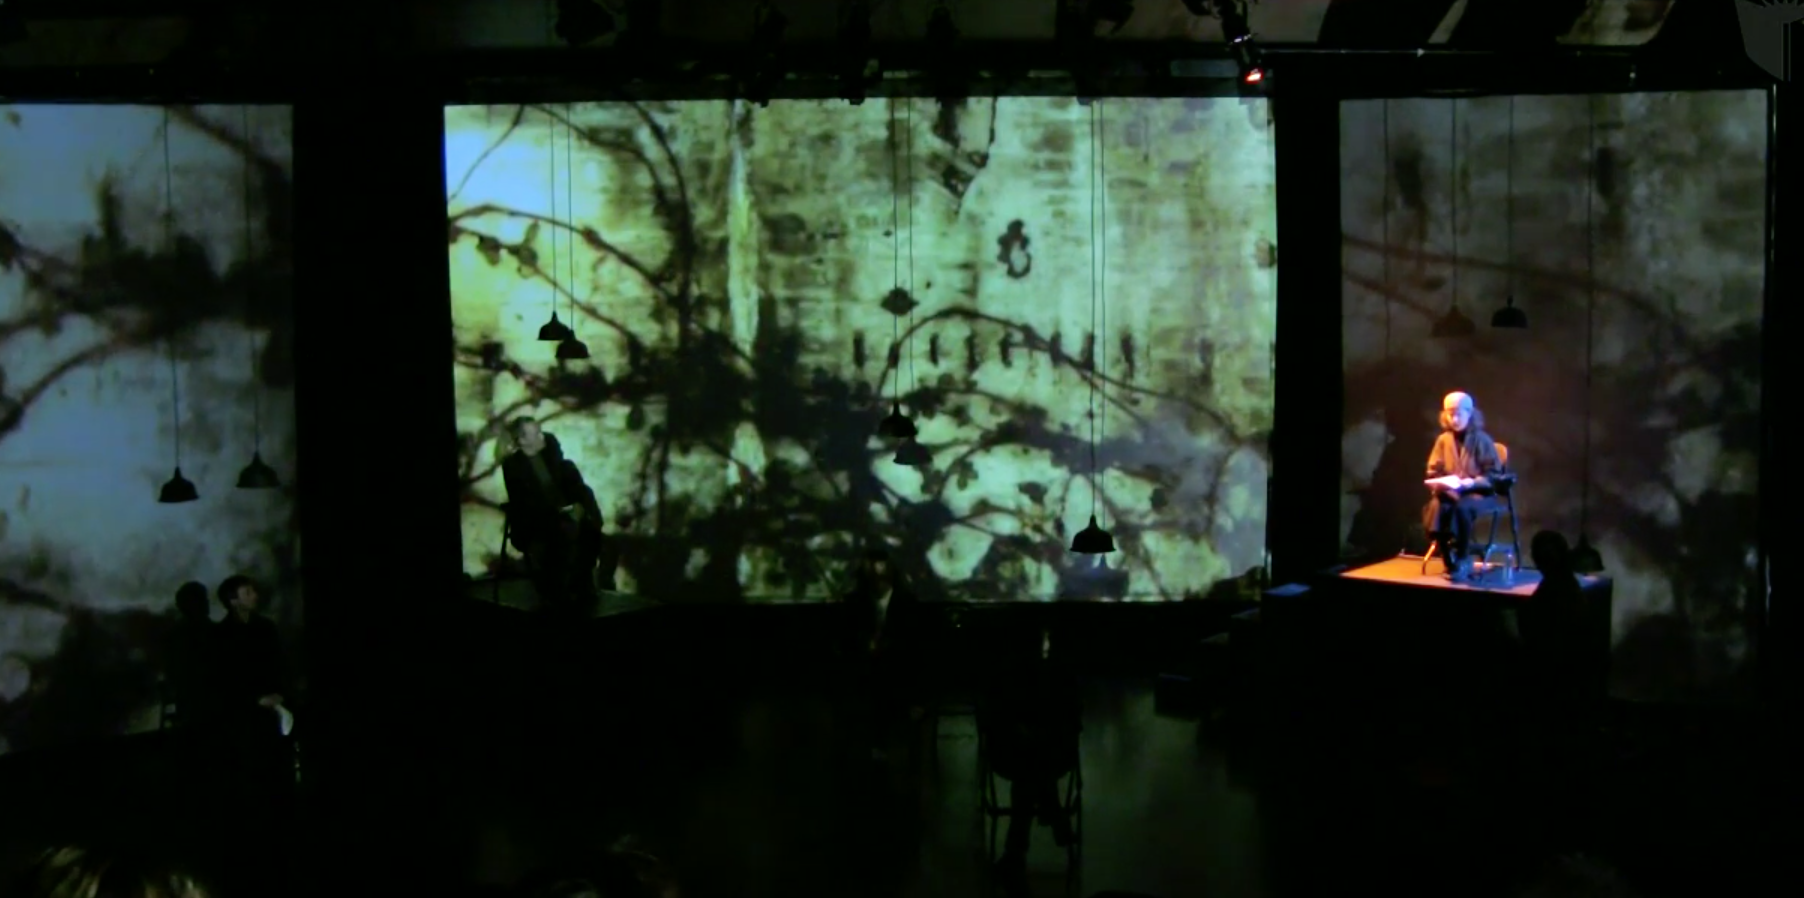 A River of Poetry (une pluie de mots, de langues, de silences) - multimedia poetry, staged by Michael Montanaro,produced by Ollivier Dyens